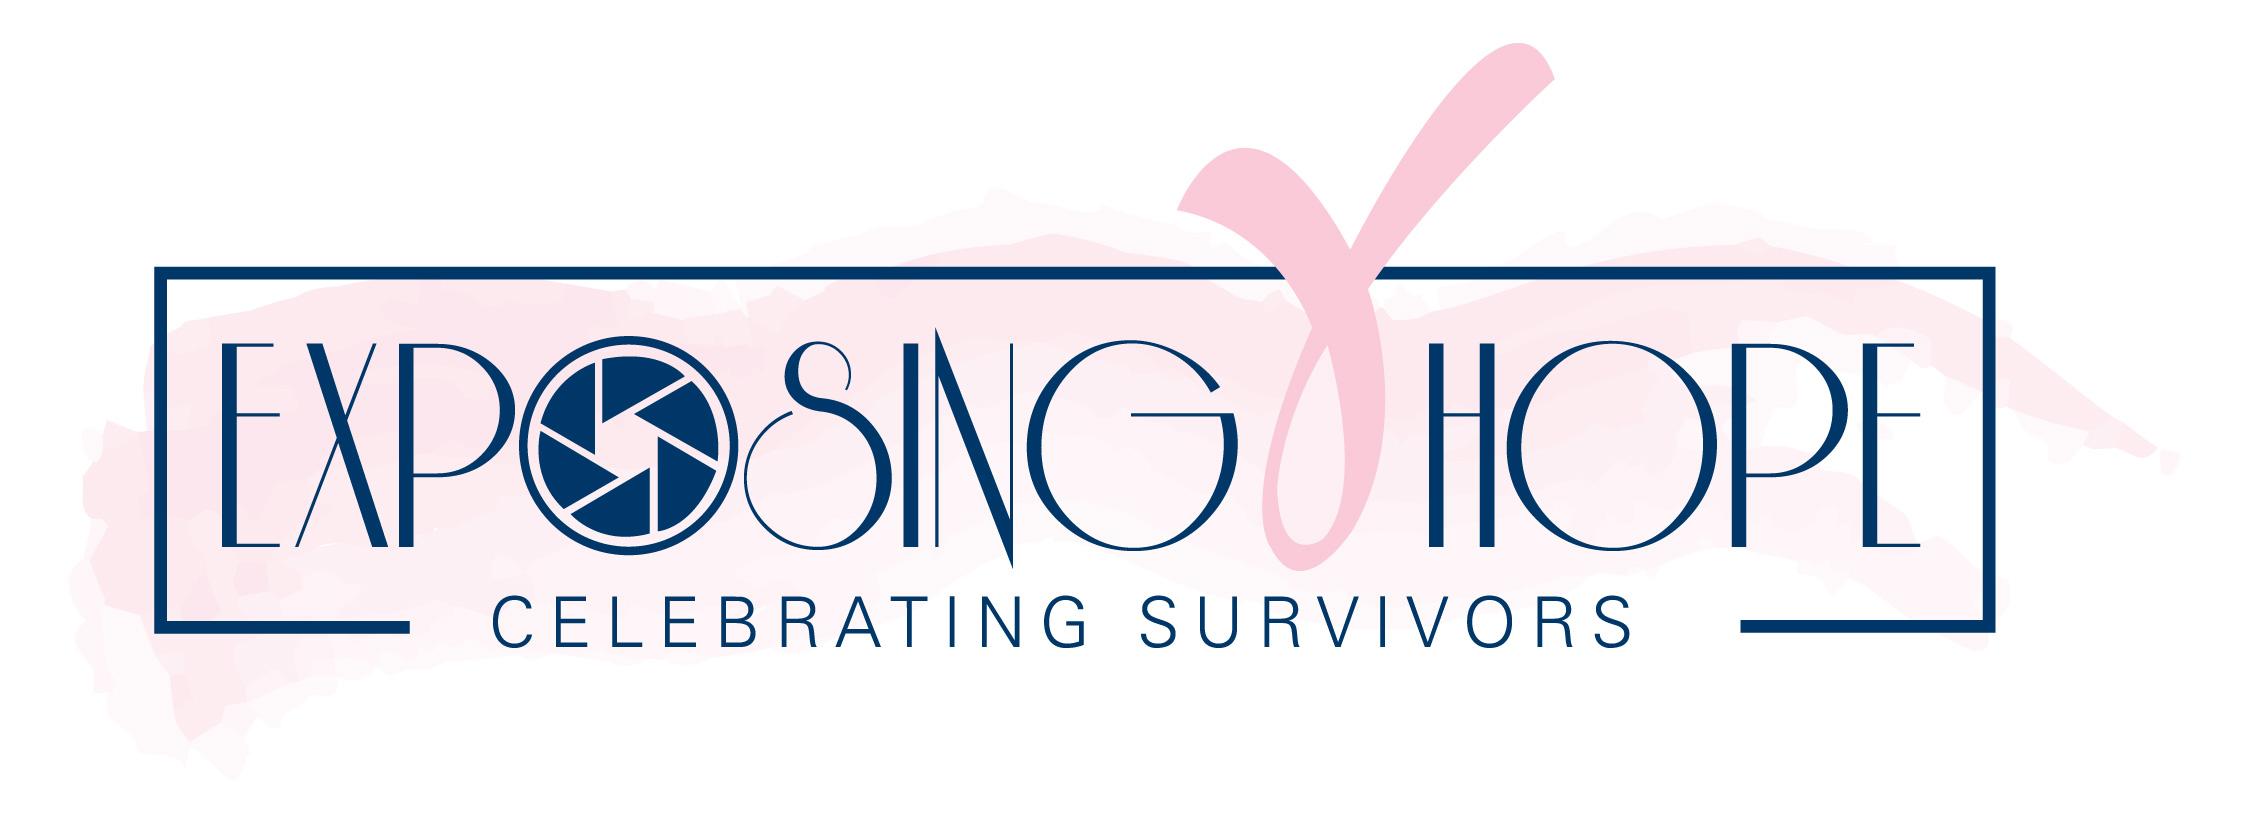 Exposed_Hope_Logo_Pink_Bkgd.jpg